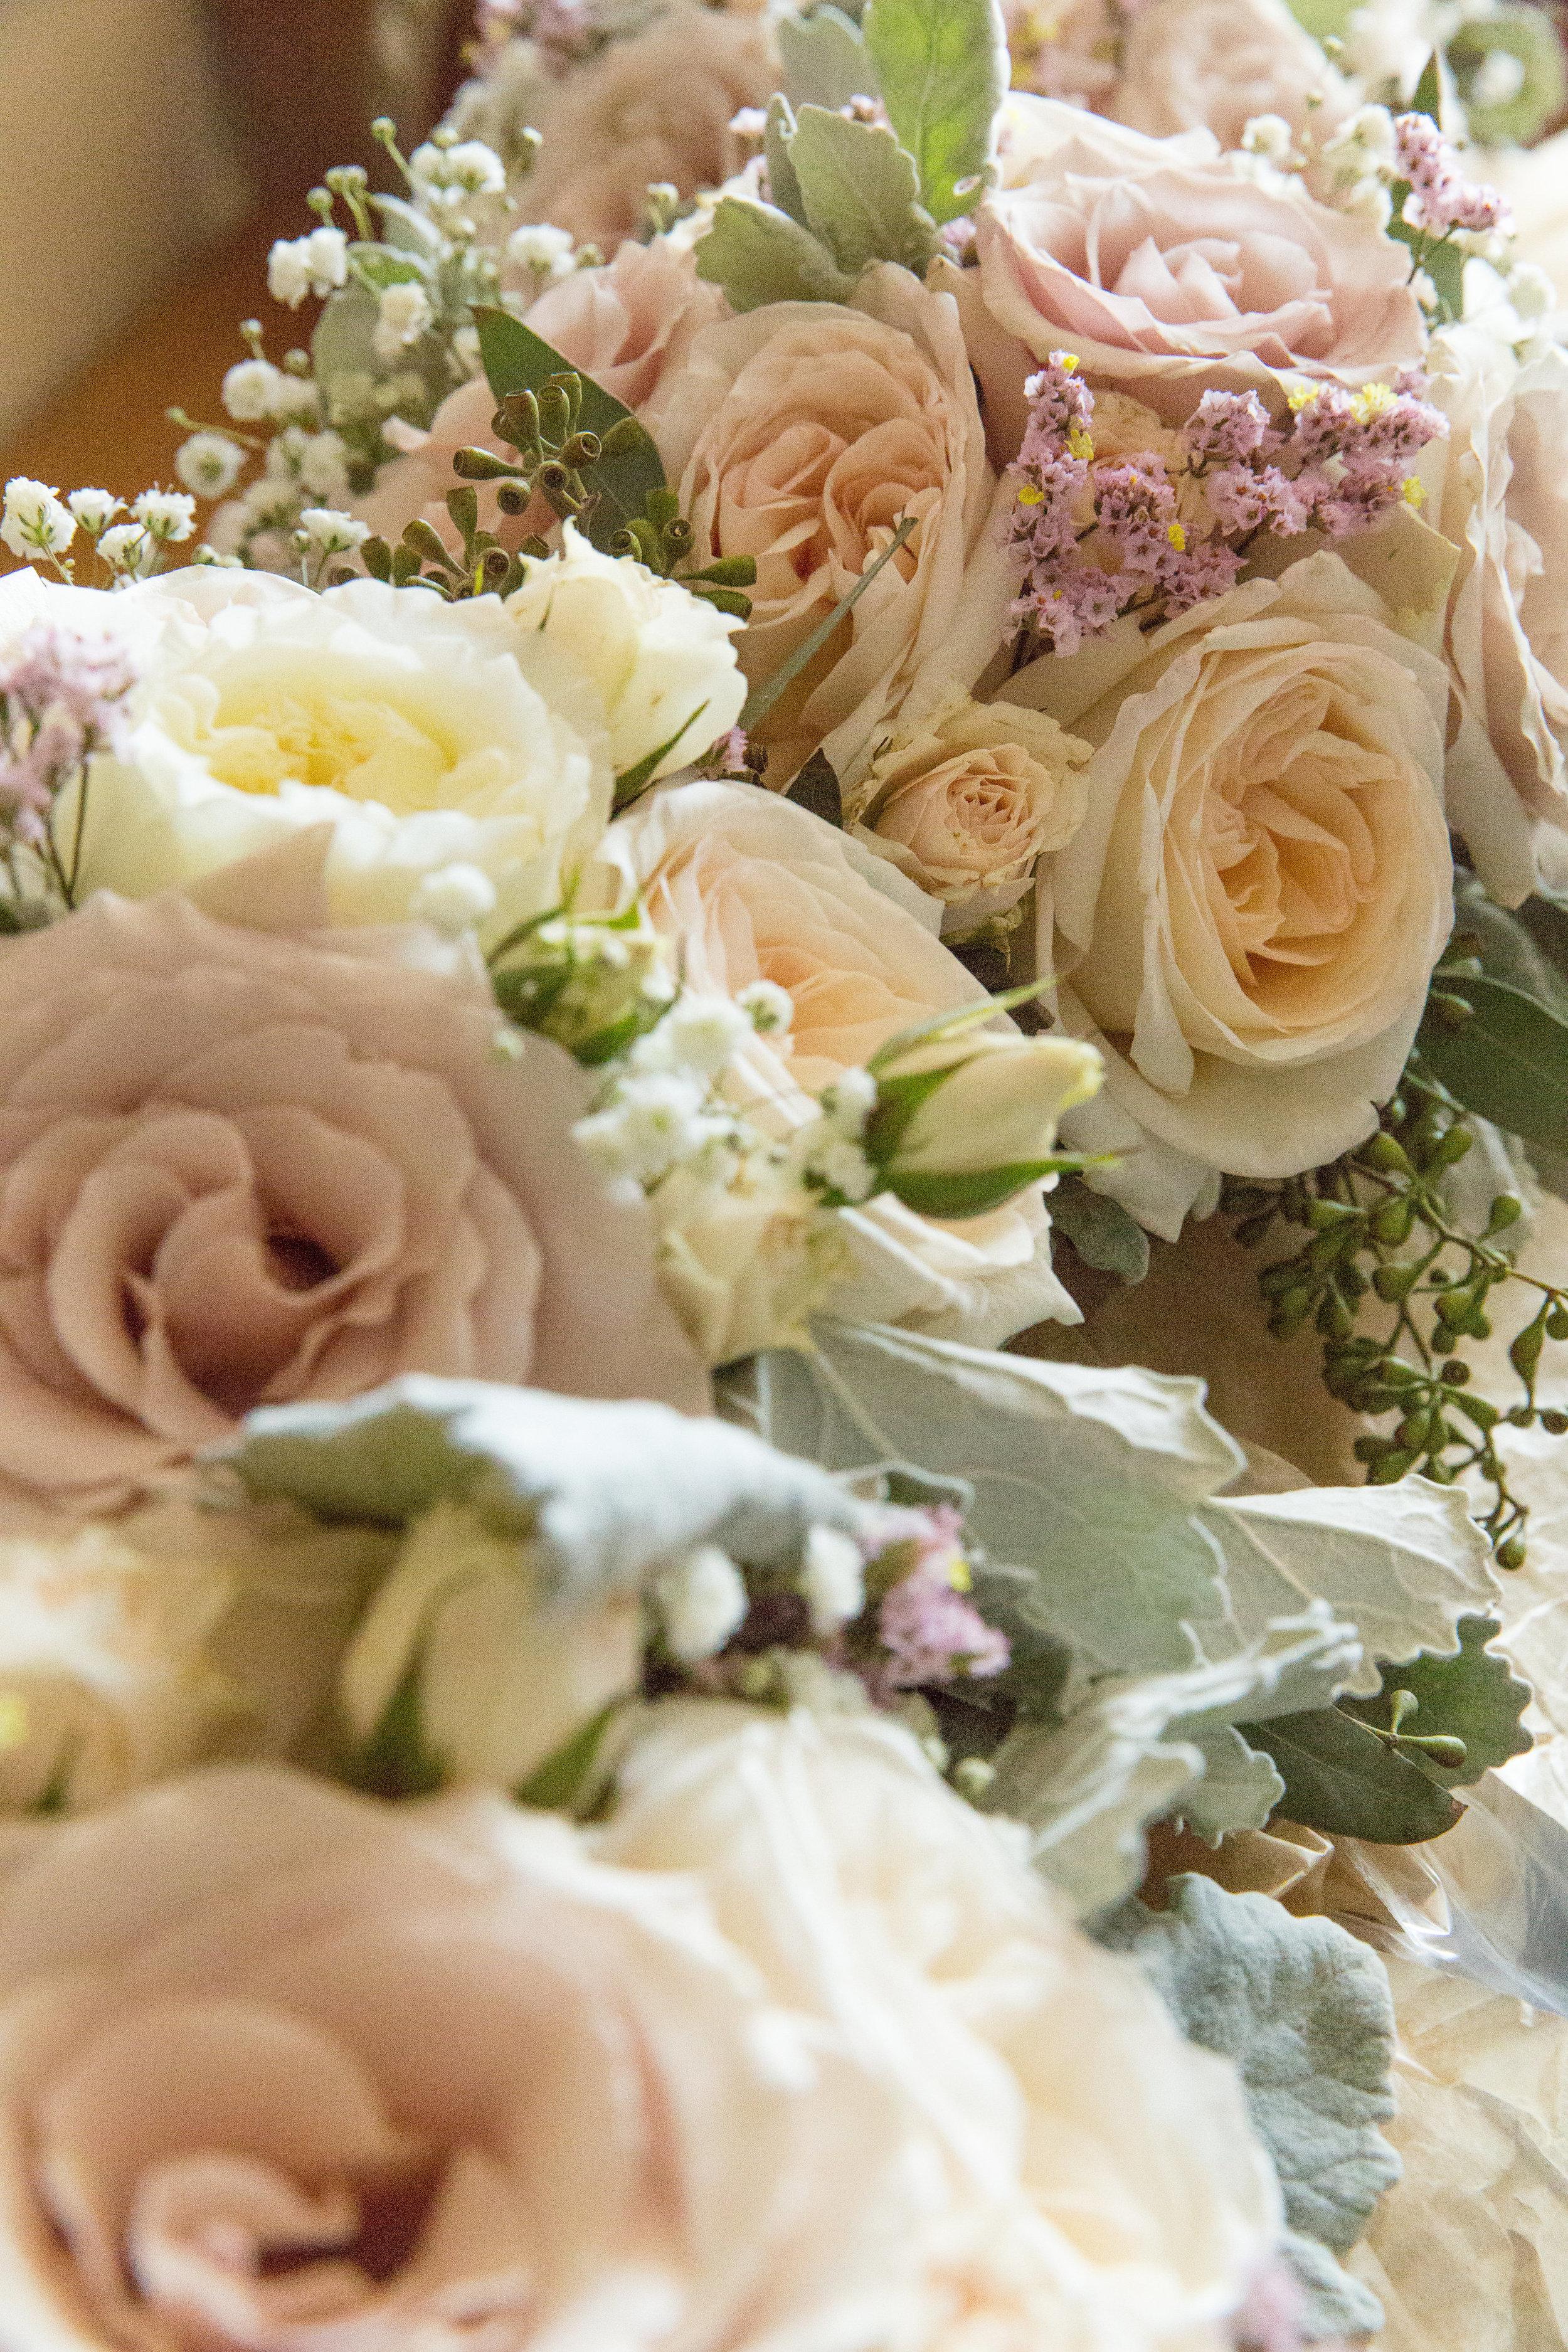 calgary custom wedding flowers for bride and bridesmaids